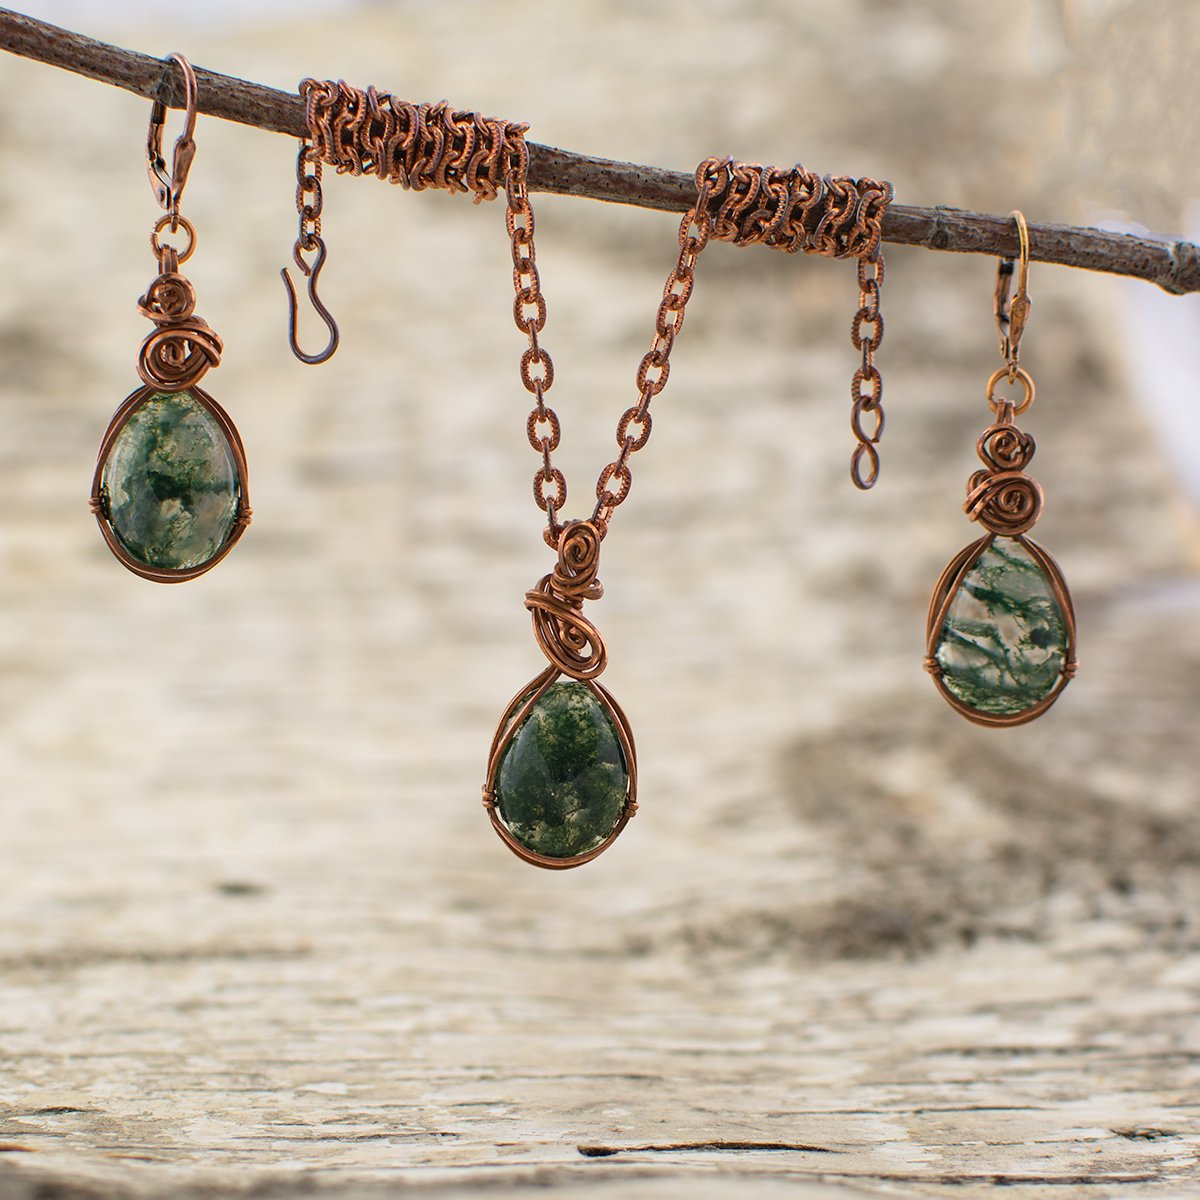 Moss Agate Stone Pendant and Earrings Set